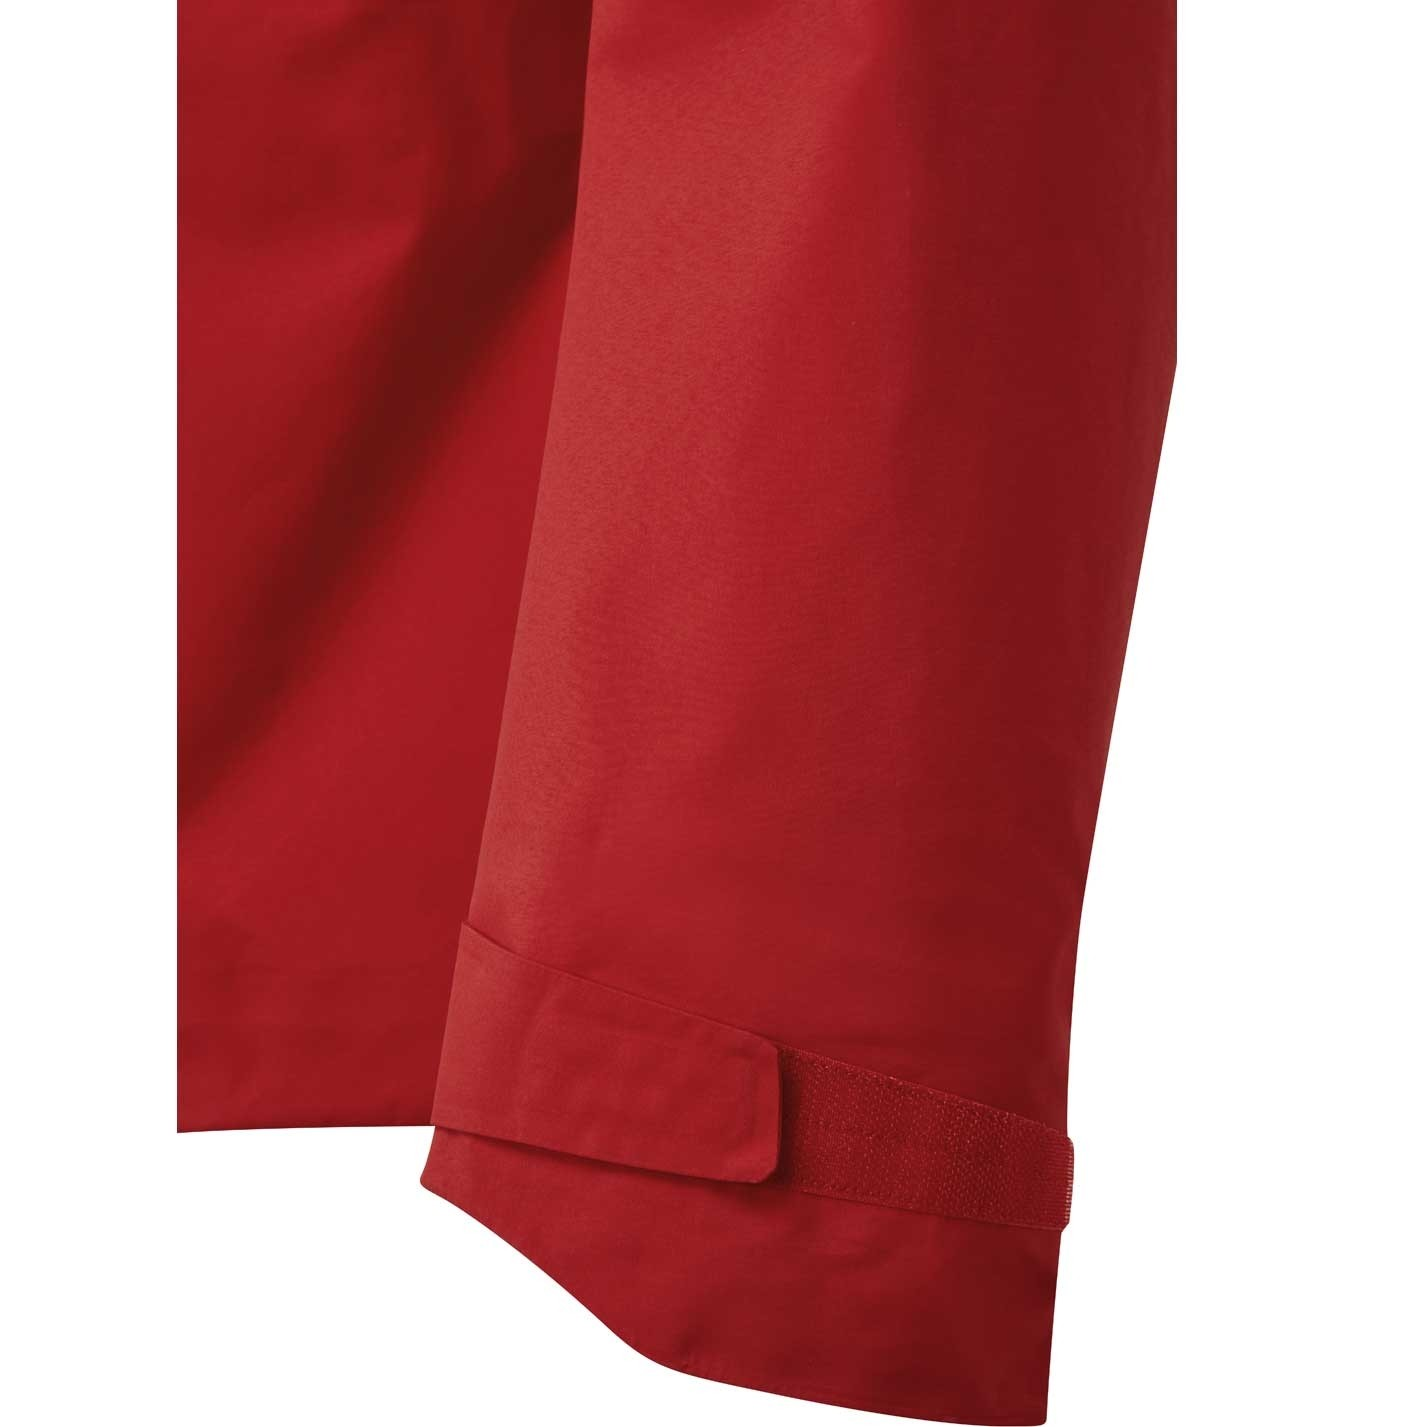 Rab Muztag GTX Waterproof Jacket - Men's - Ascent Red